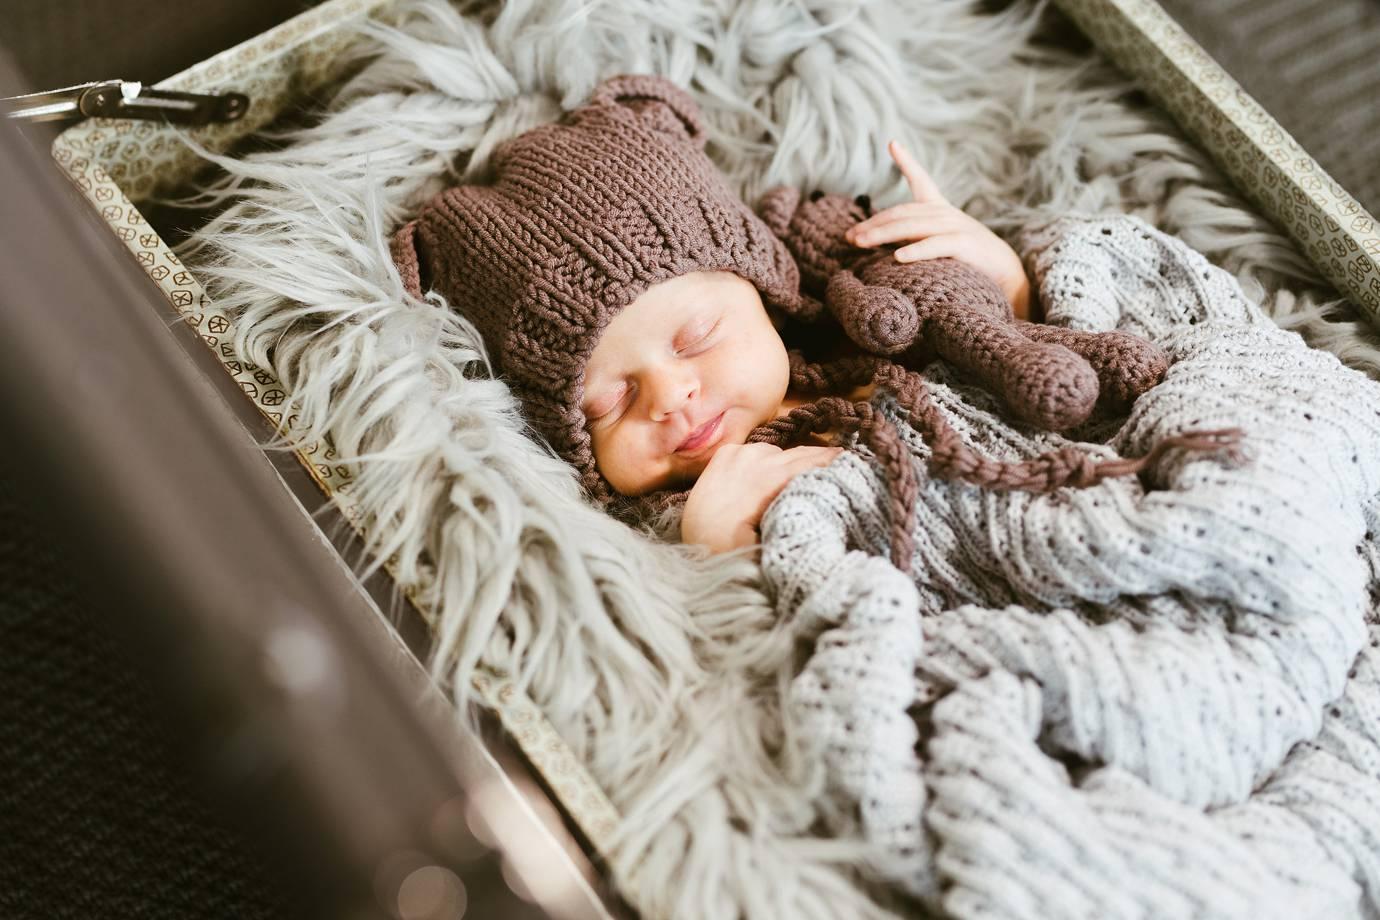 babyfotograf ritterhude 09 - Nika